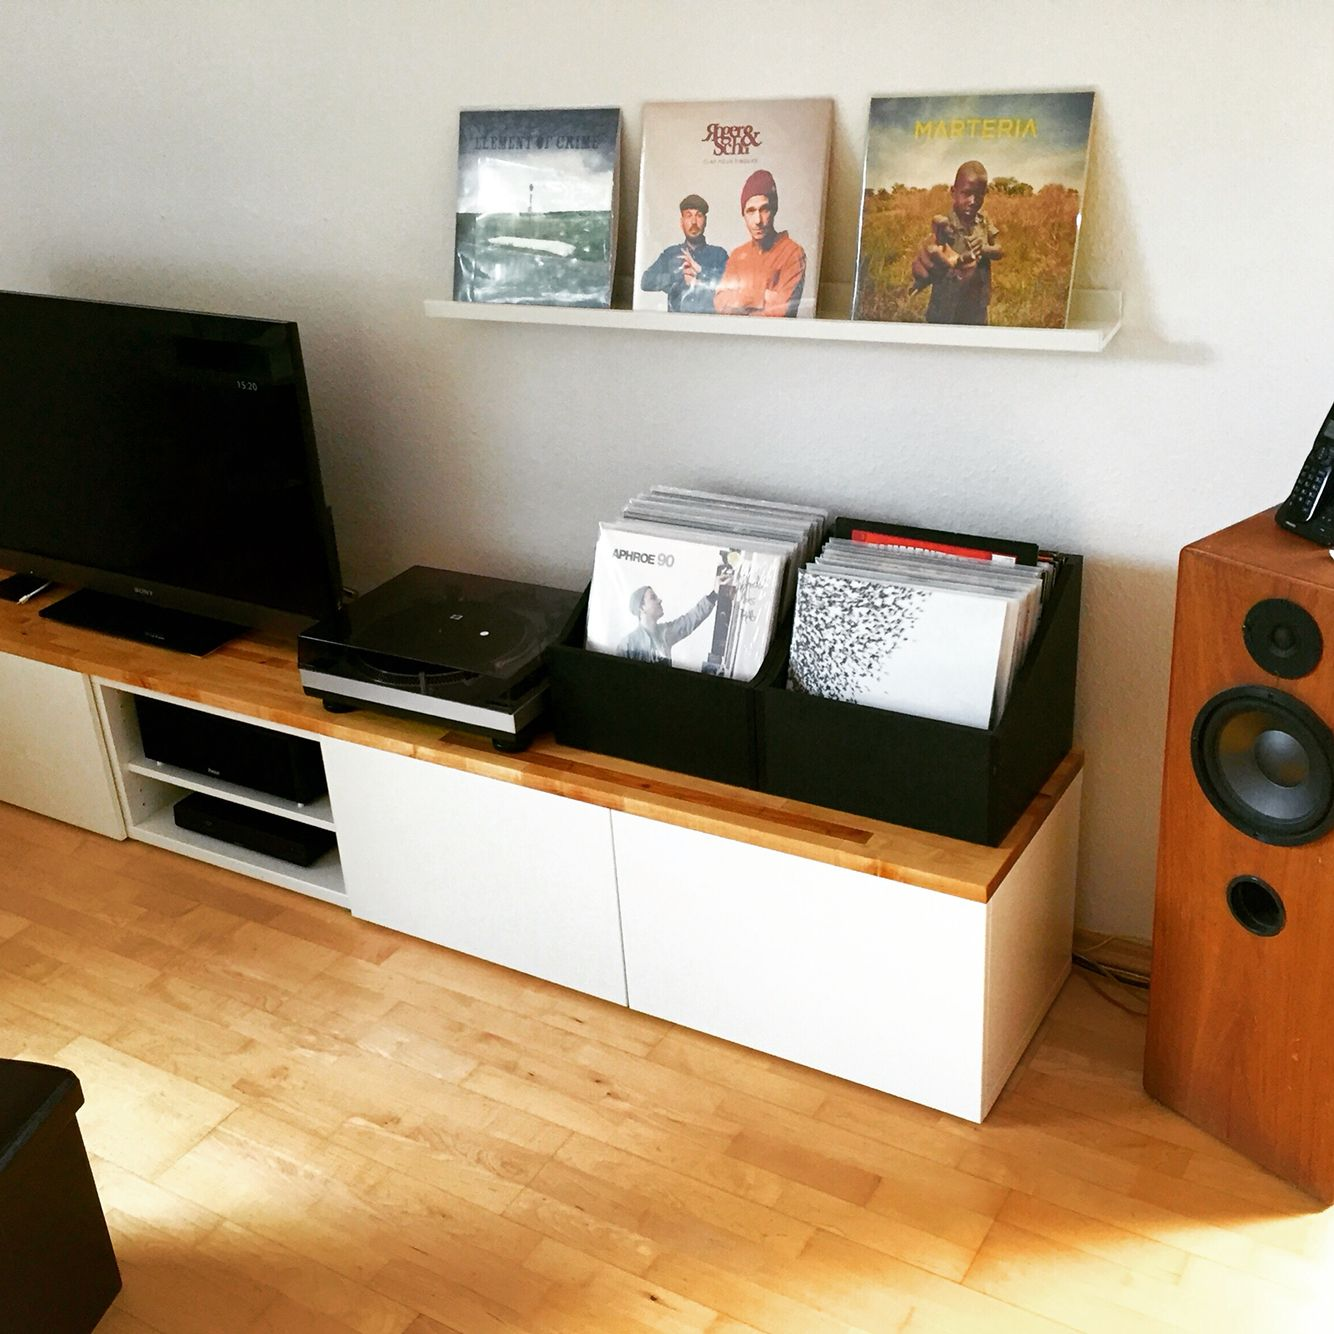 ikea besta hack besta hacks pinterest ikea hack living rooms and loft ideas. Black Bedroom Furniture Sets. Home Design Ideas